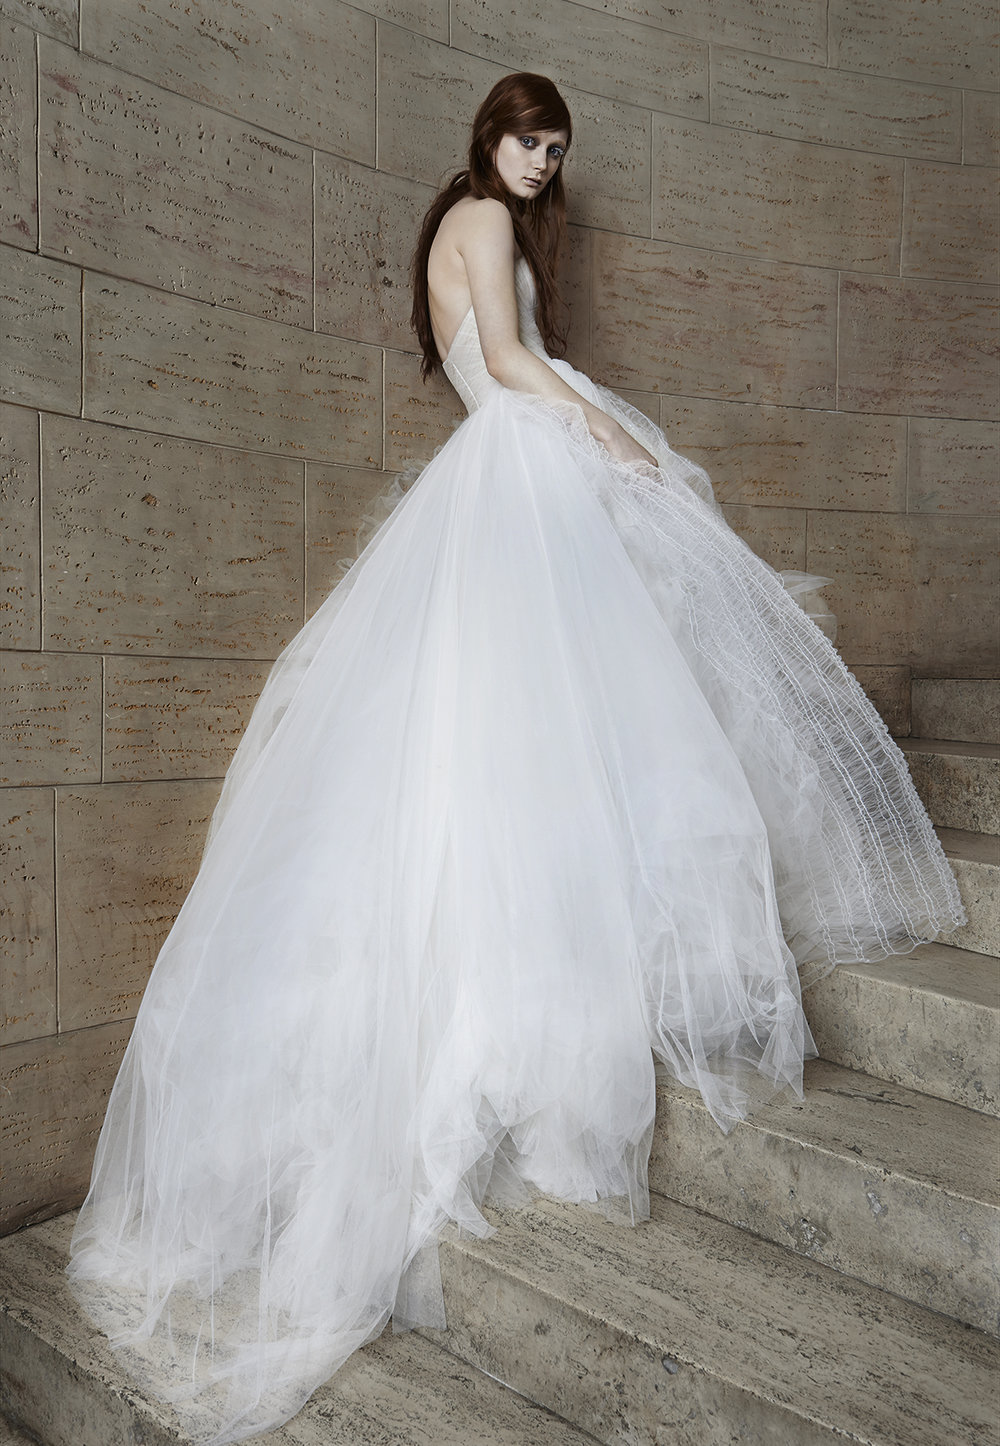 Iconic Style    Gown Name: Octavia 抹胸领口公主大裙剪裁的婚纱    Description: 抹胸领口公主大裙剪裁的婚纱,Octavia 是一袭充满了动态美感的婚纱,新 娘在行走中裙体仿佛被片片随意而轻盈的薄纱围绕。手工的薄纱抓折胸衣,无负担紧密的 贴紧身躯,营造纤细的腰身。不规则的薄纱,如蝉翼般轻柔,穿在身上一点也不嫌重。穿 着她的新娘可爱、柔软而自由,仿若云朵漂浮着被风带往任何地方。